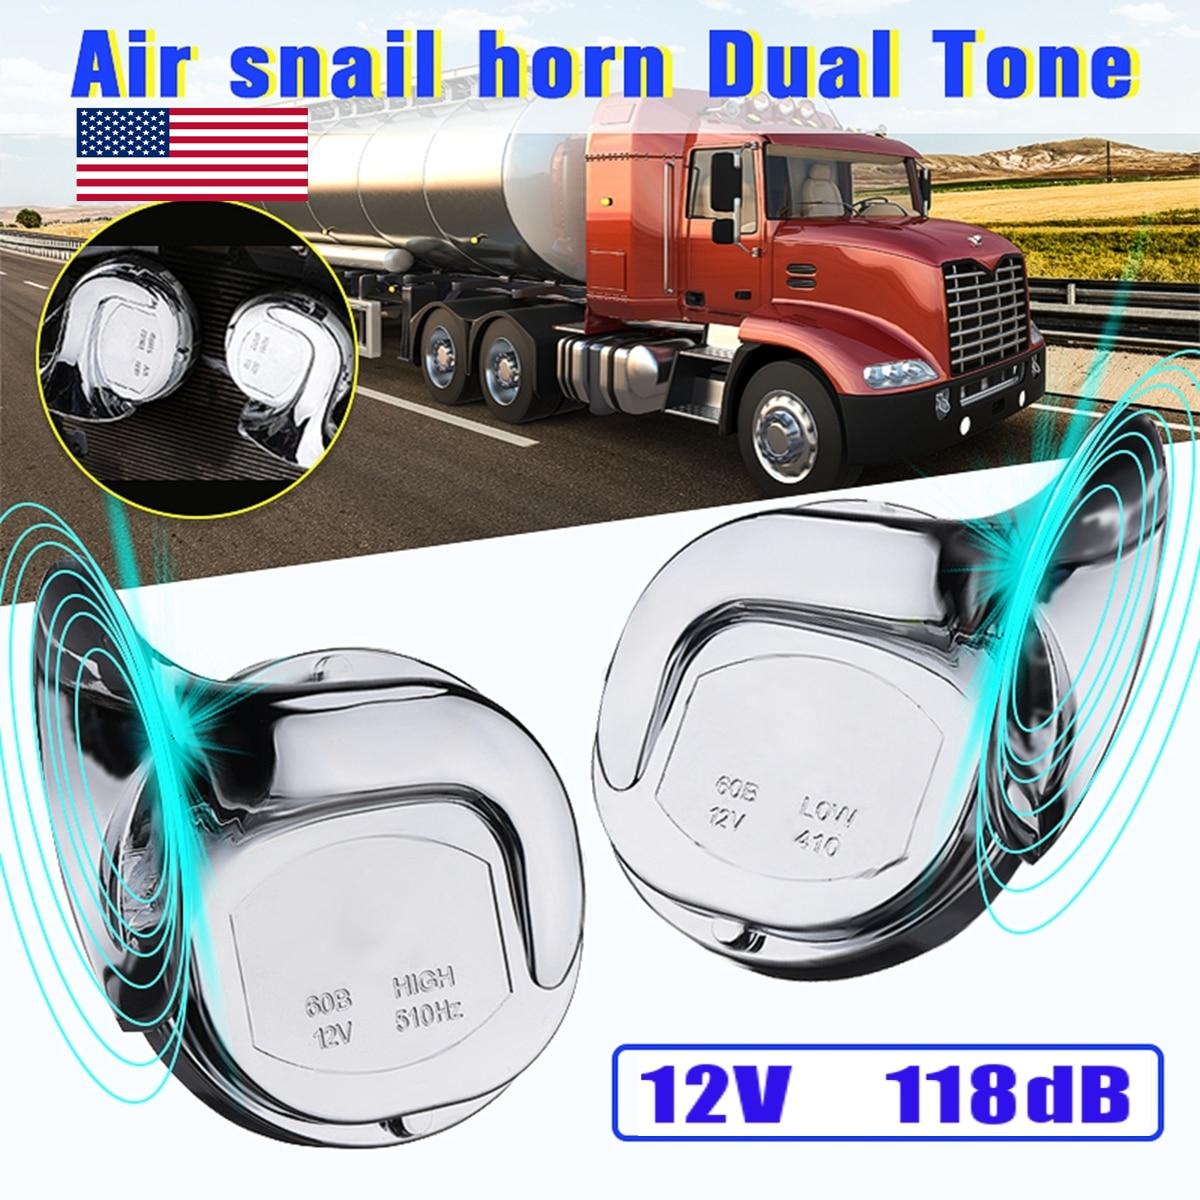 Par de bocina de Caracol de aire de doble tono cromado Universal de 12V 110dB para motocicleta y furgoneta